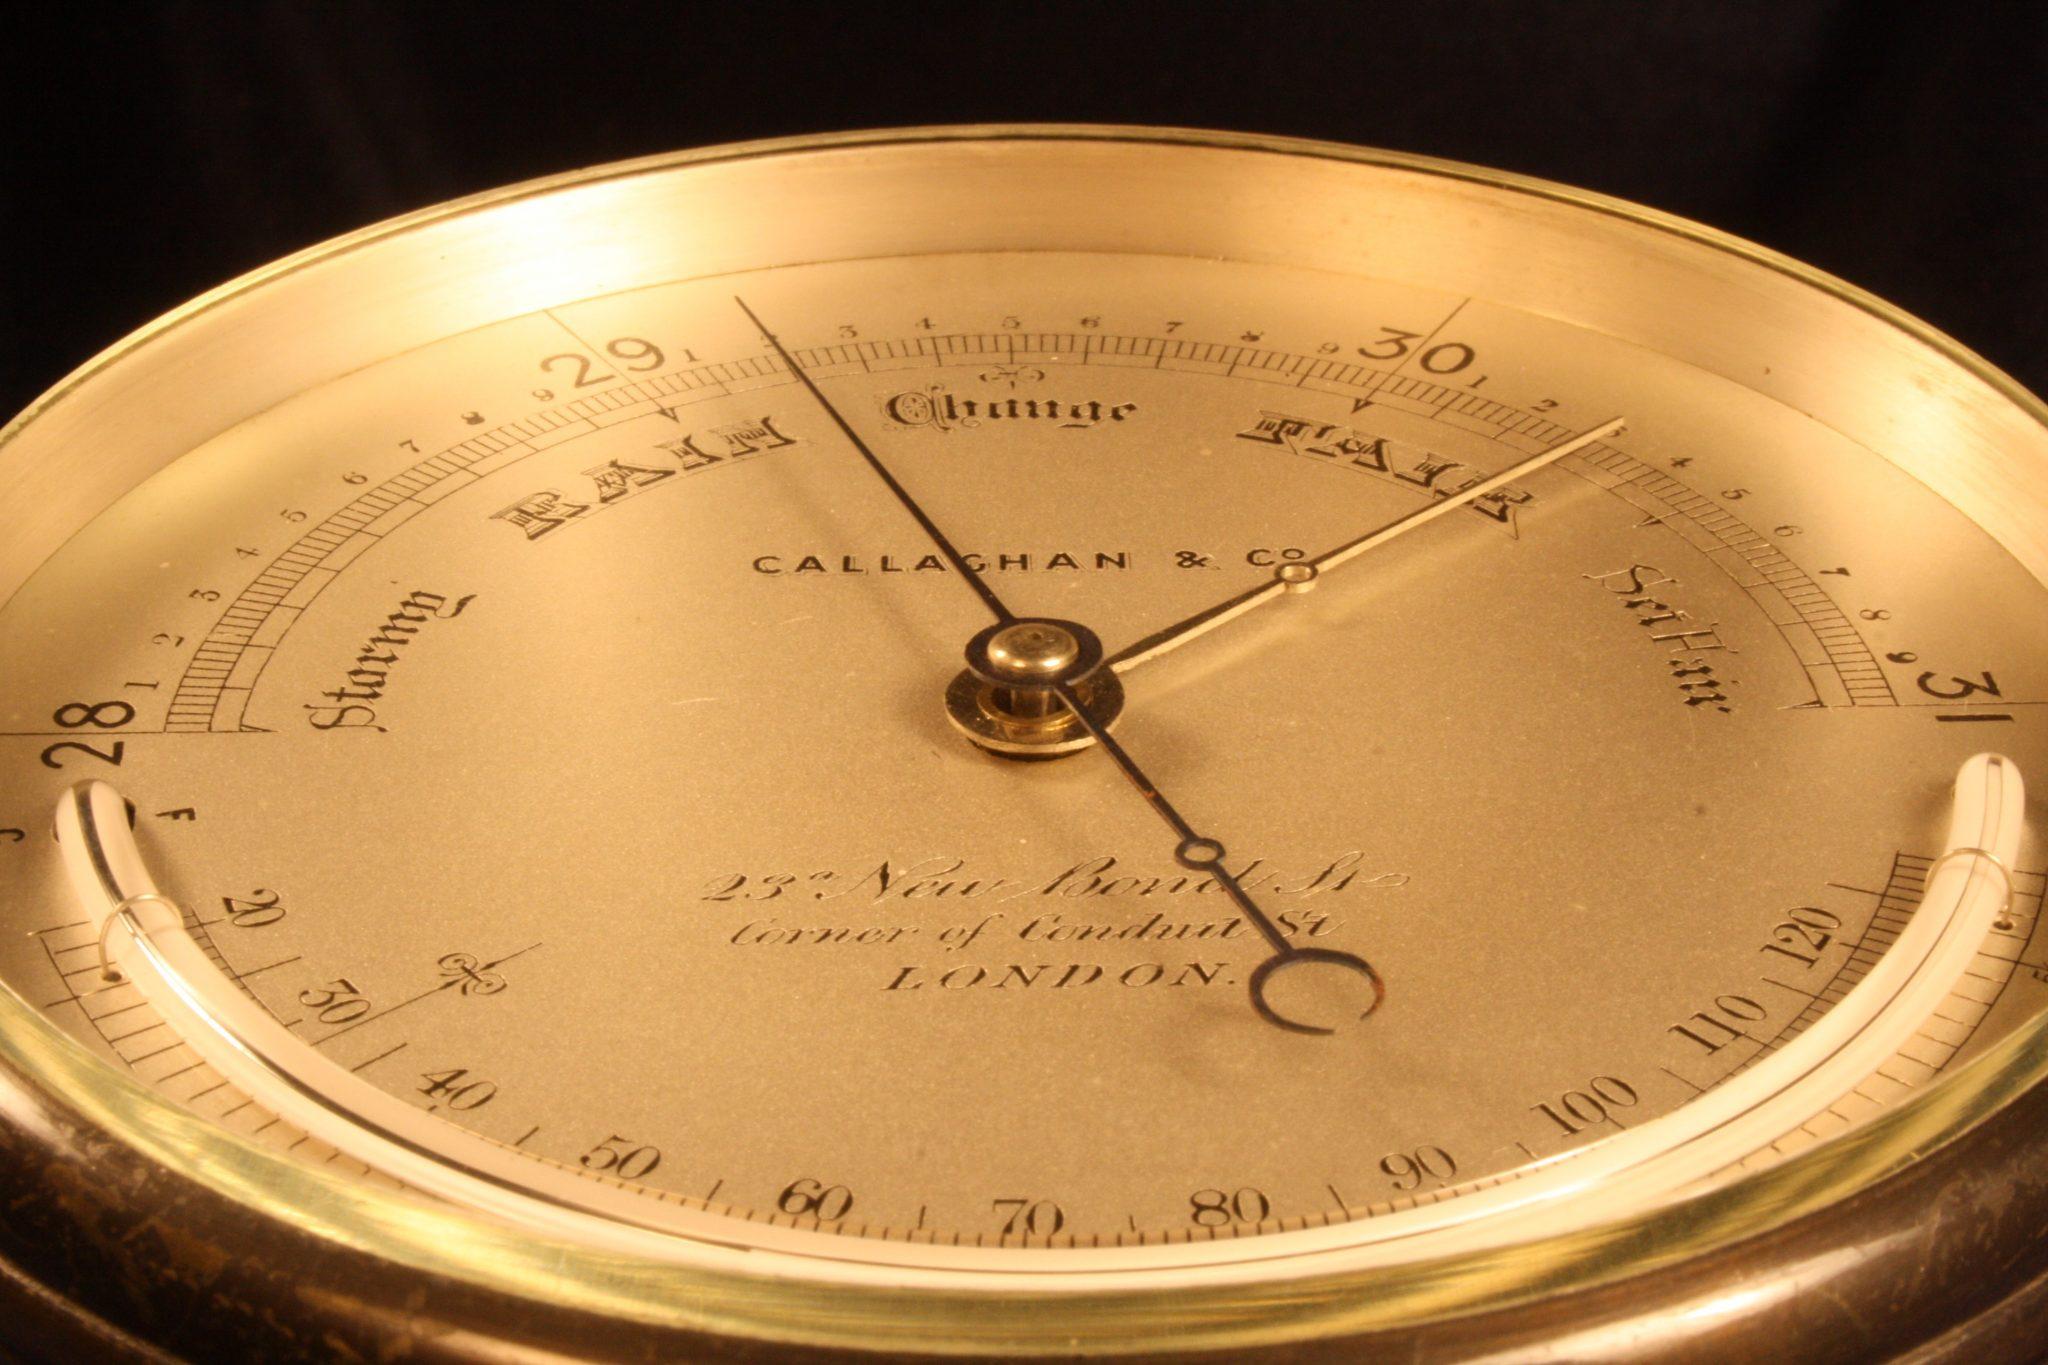 Image of Callaghan Barometer No 5993